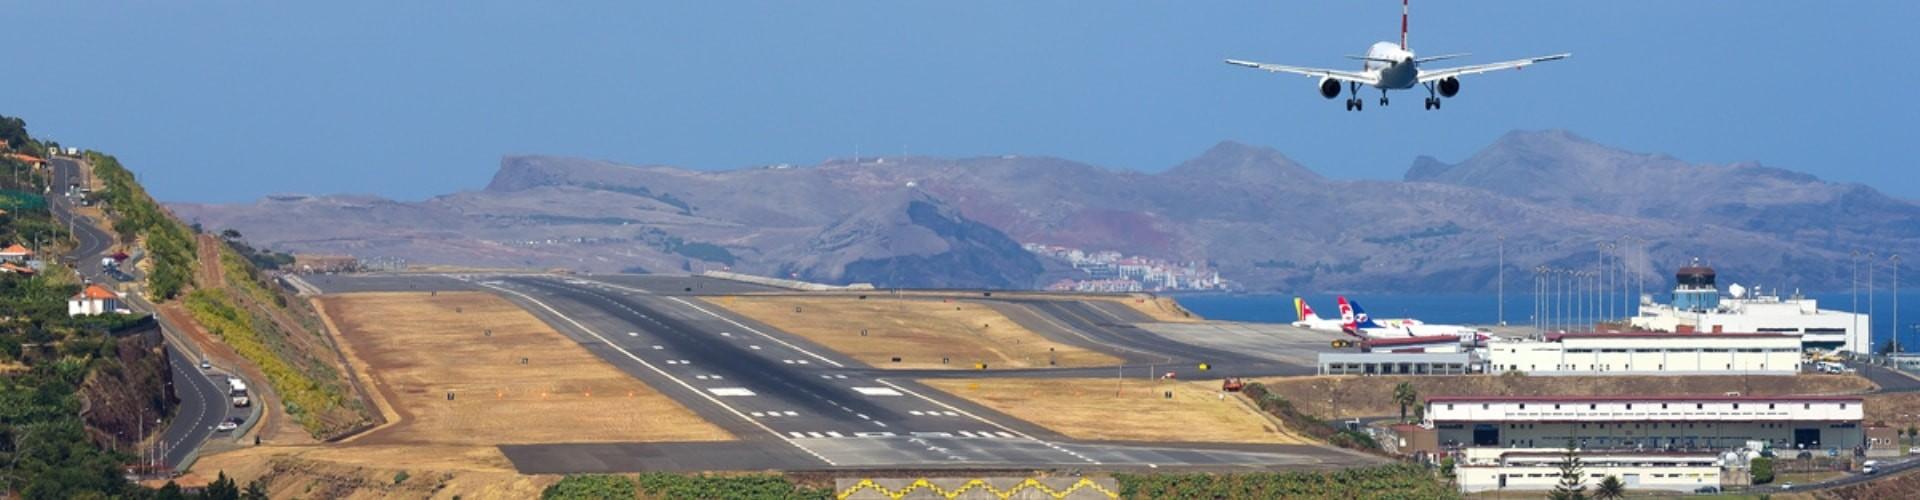 Madeira Island Airport